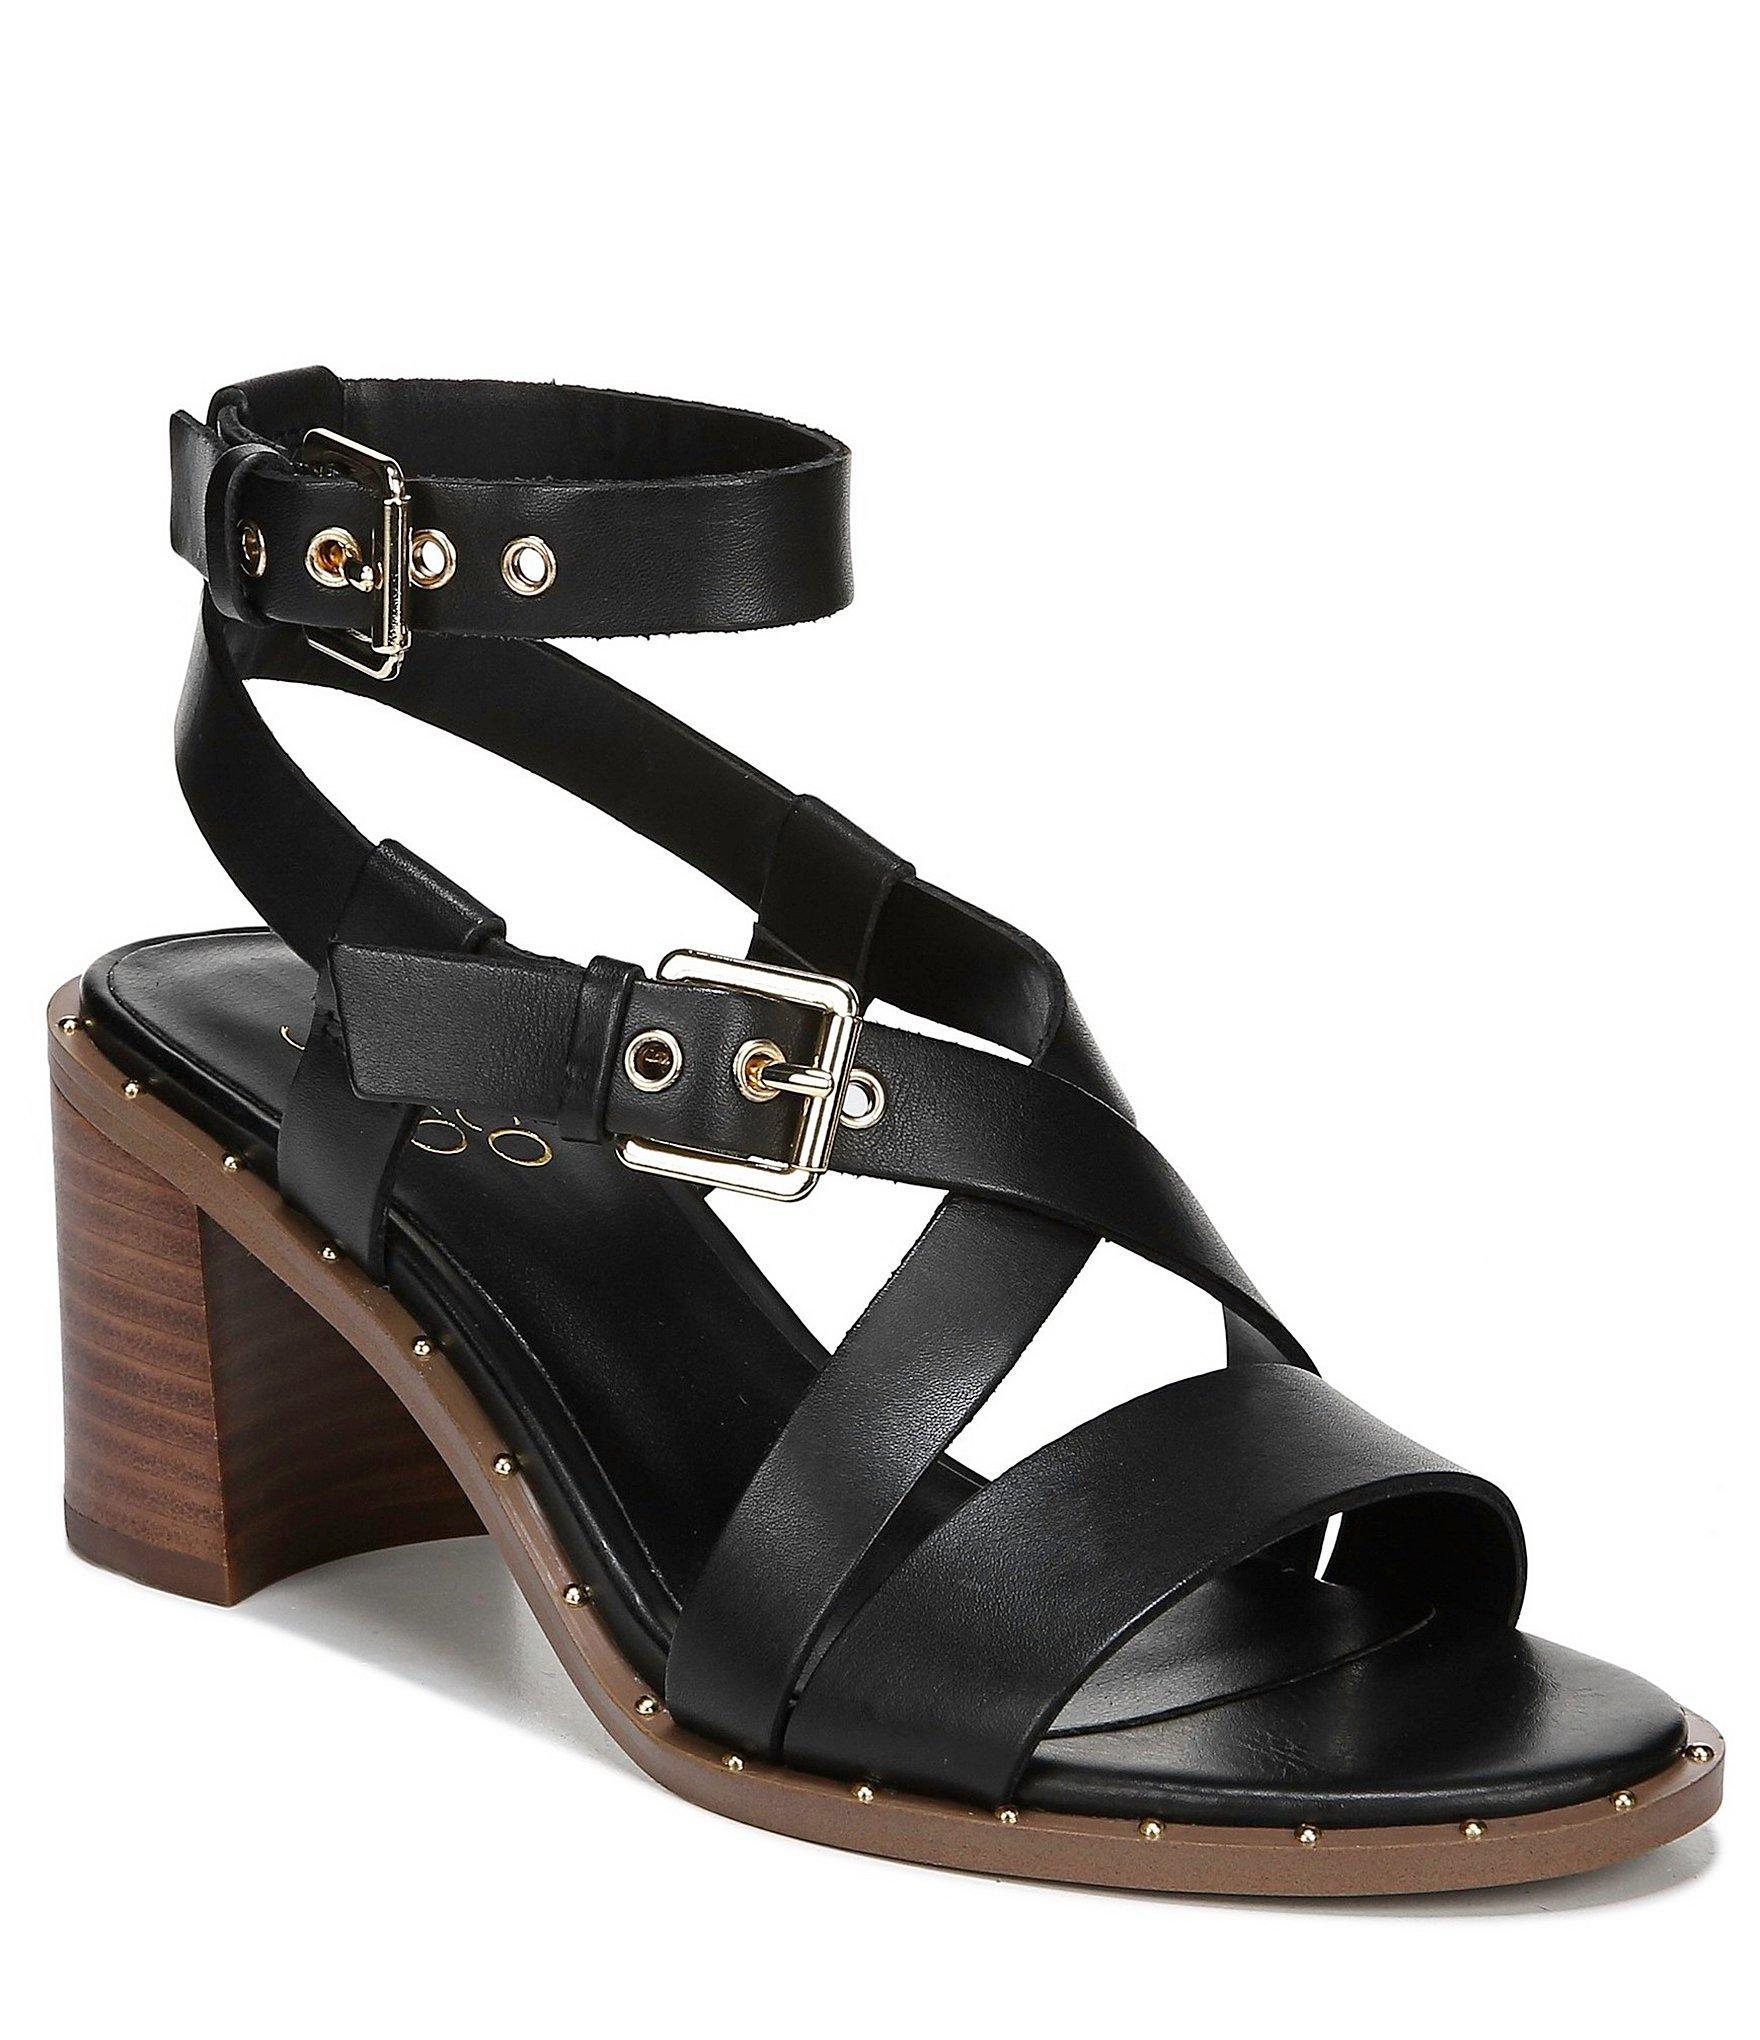 67fc5beb4 Lyst - Franco Sarto Halina Leather Block Heel Sandals in Black